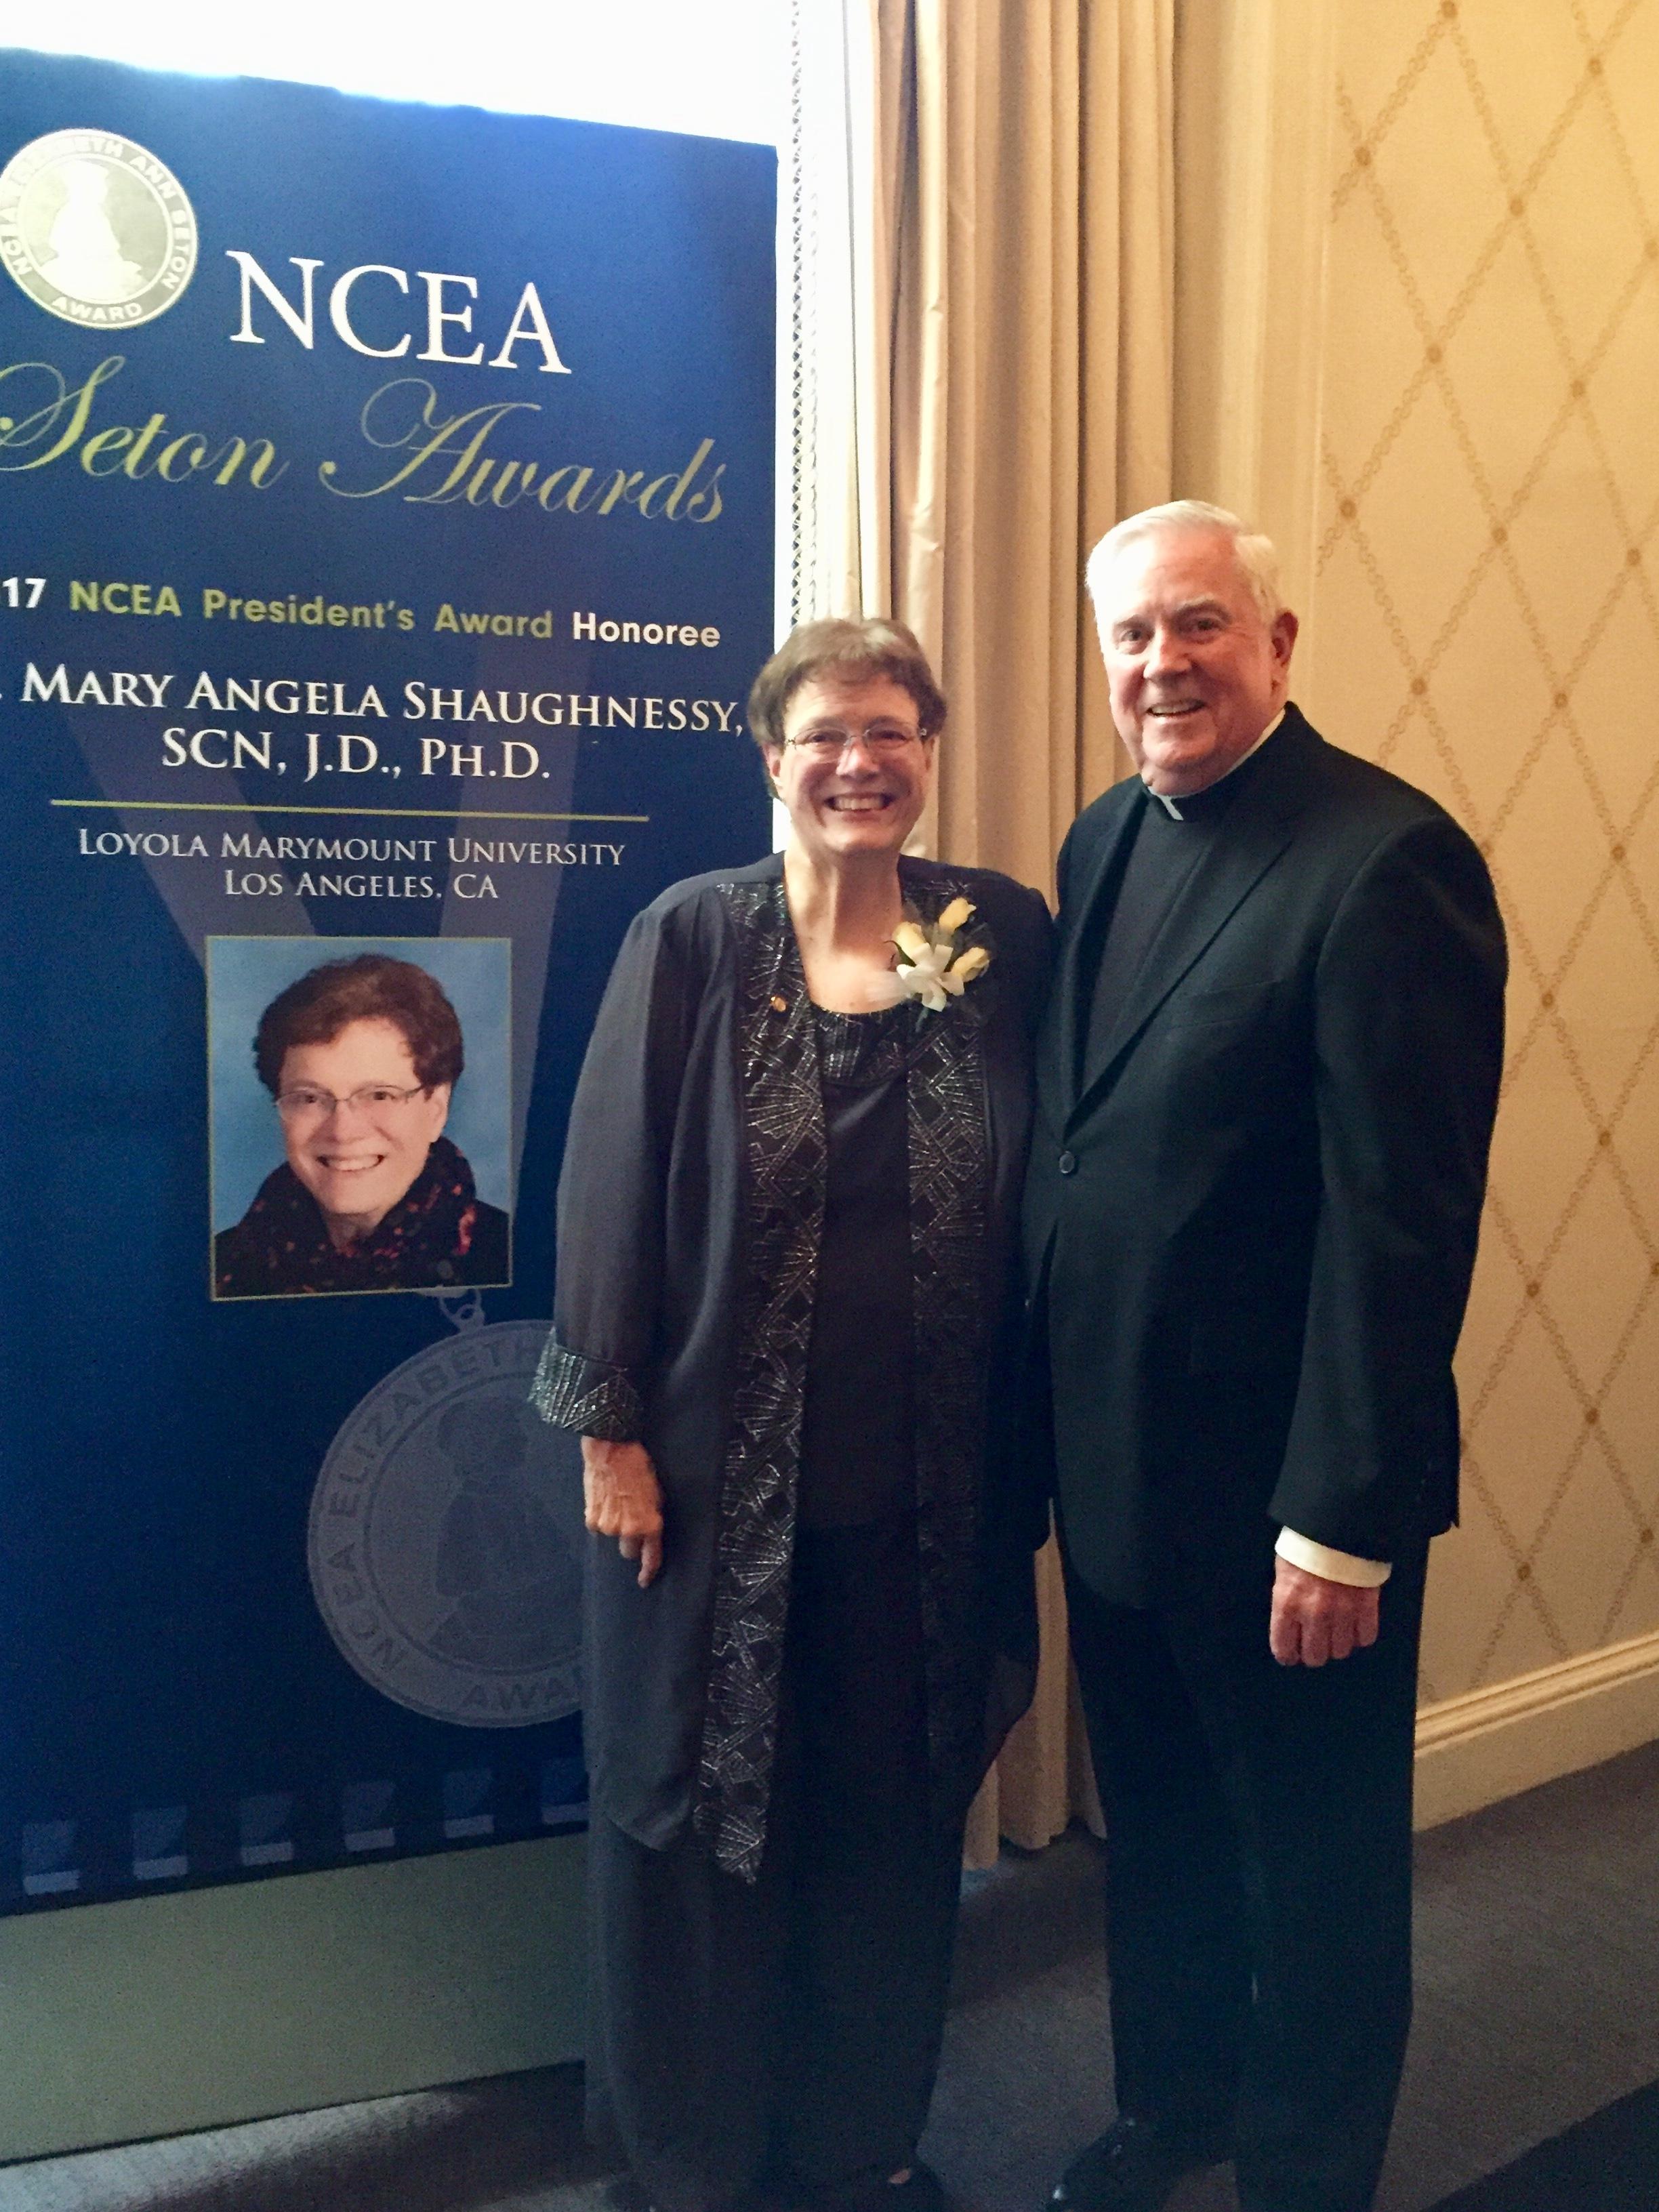 Mary Angela Shaughnessy and Shane Martin at NCEA awards